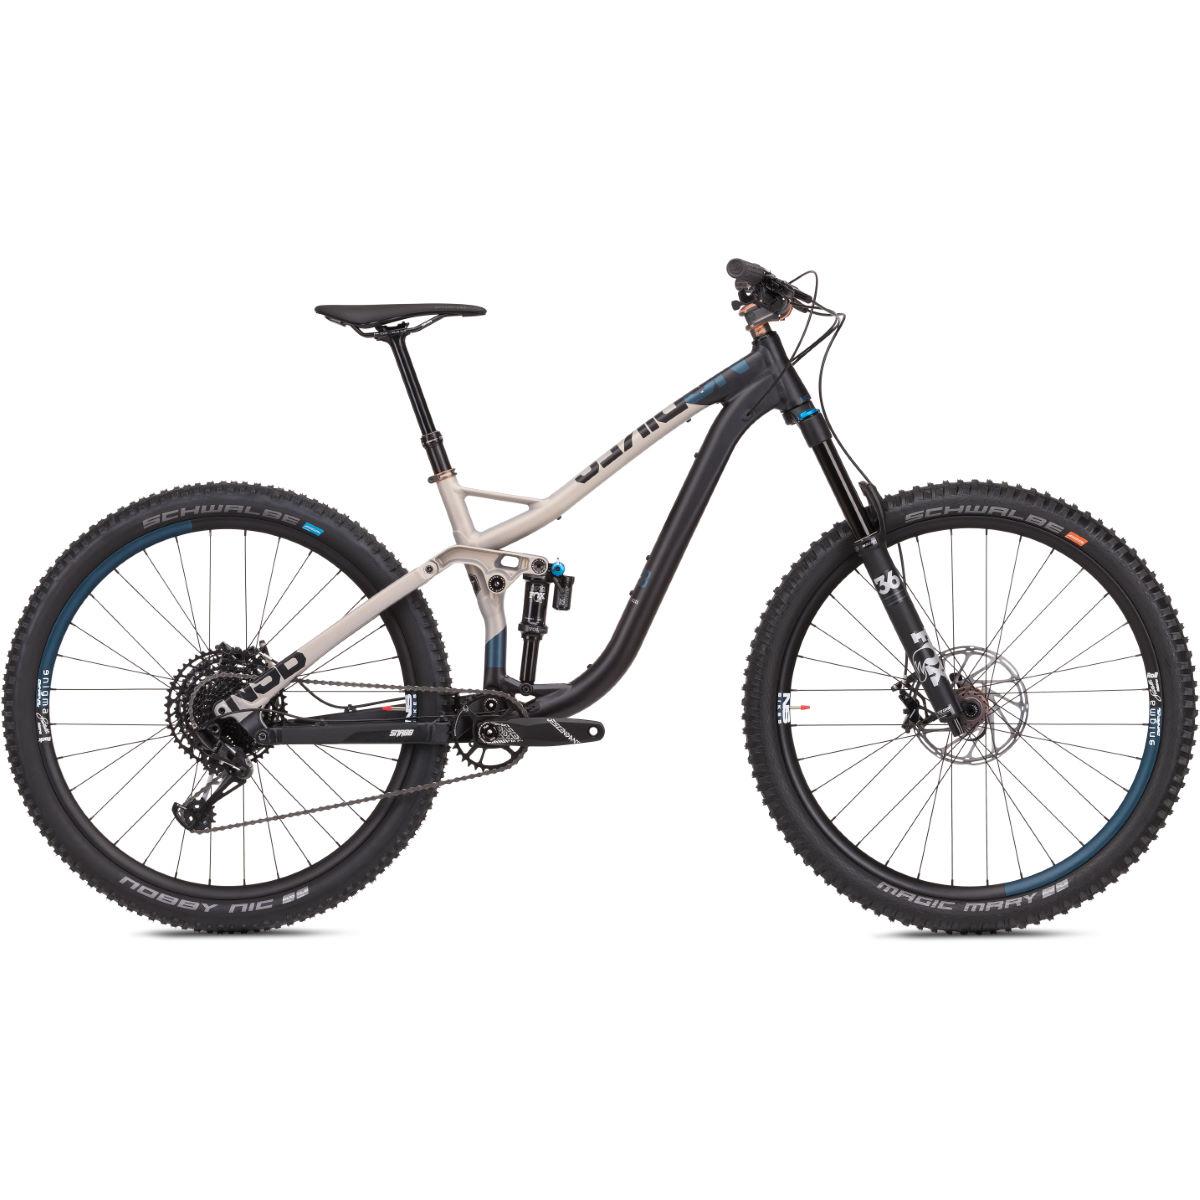 NS Bikes Snabb 150 Plus 1 Full